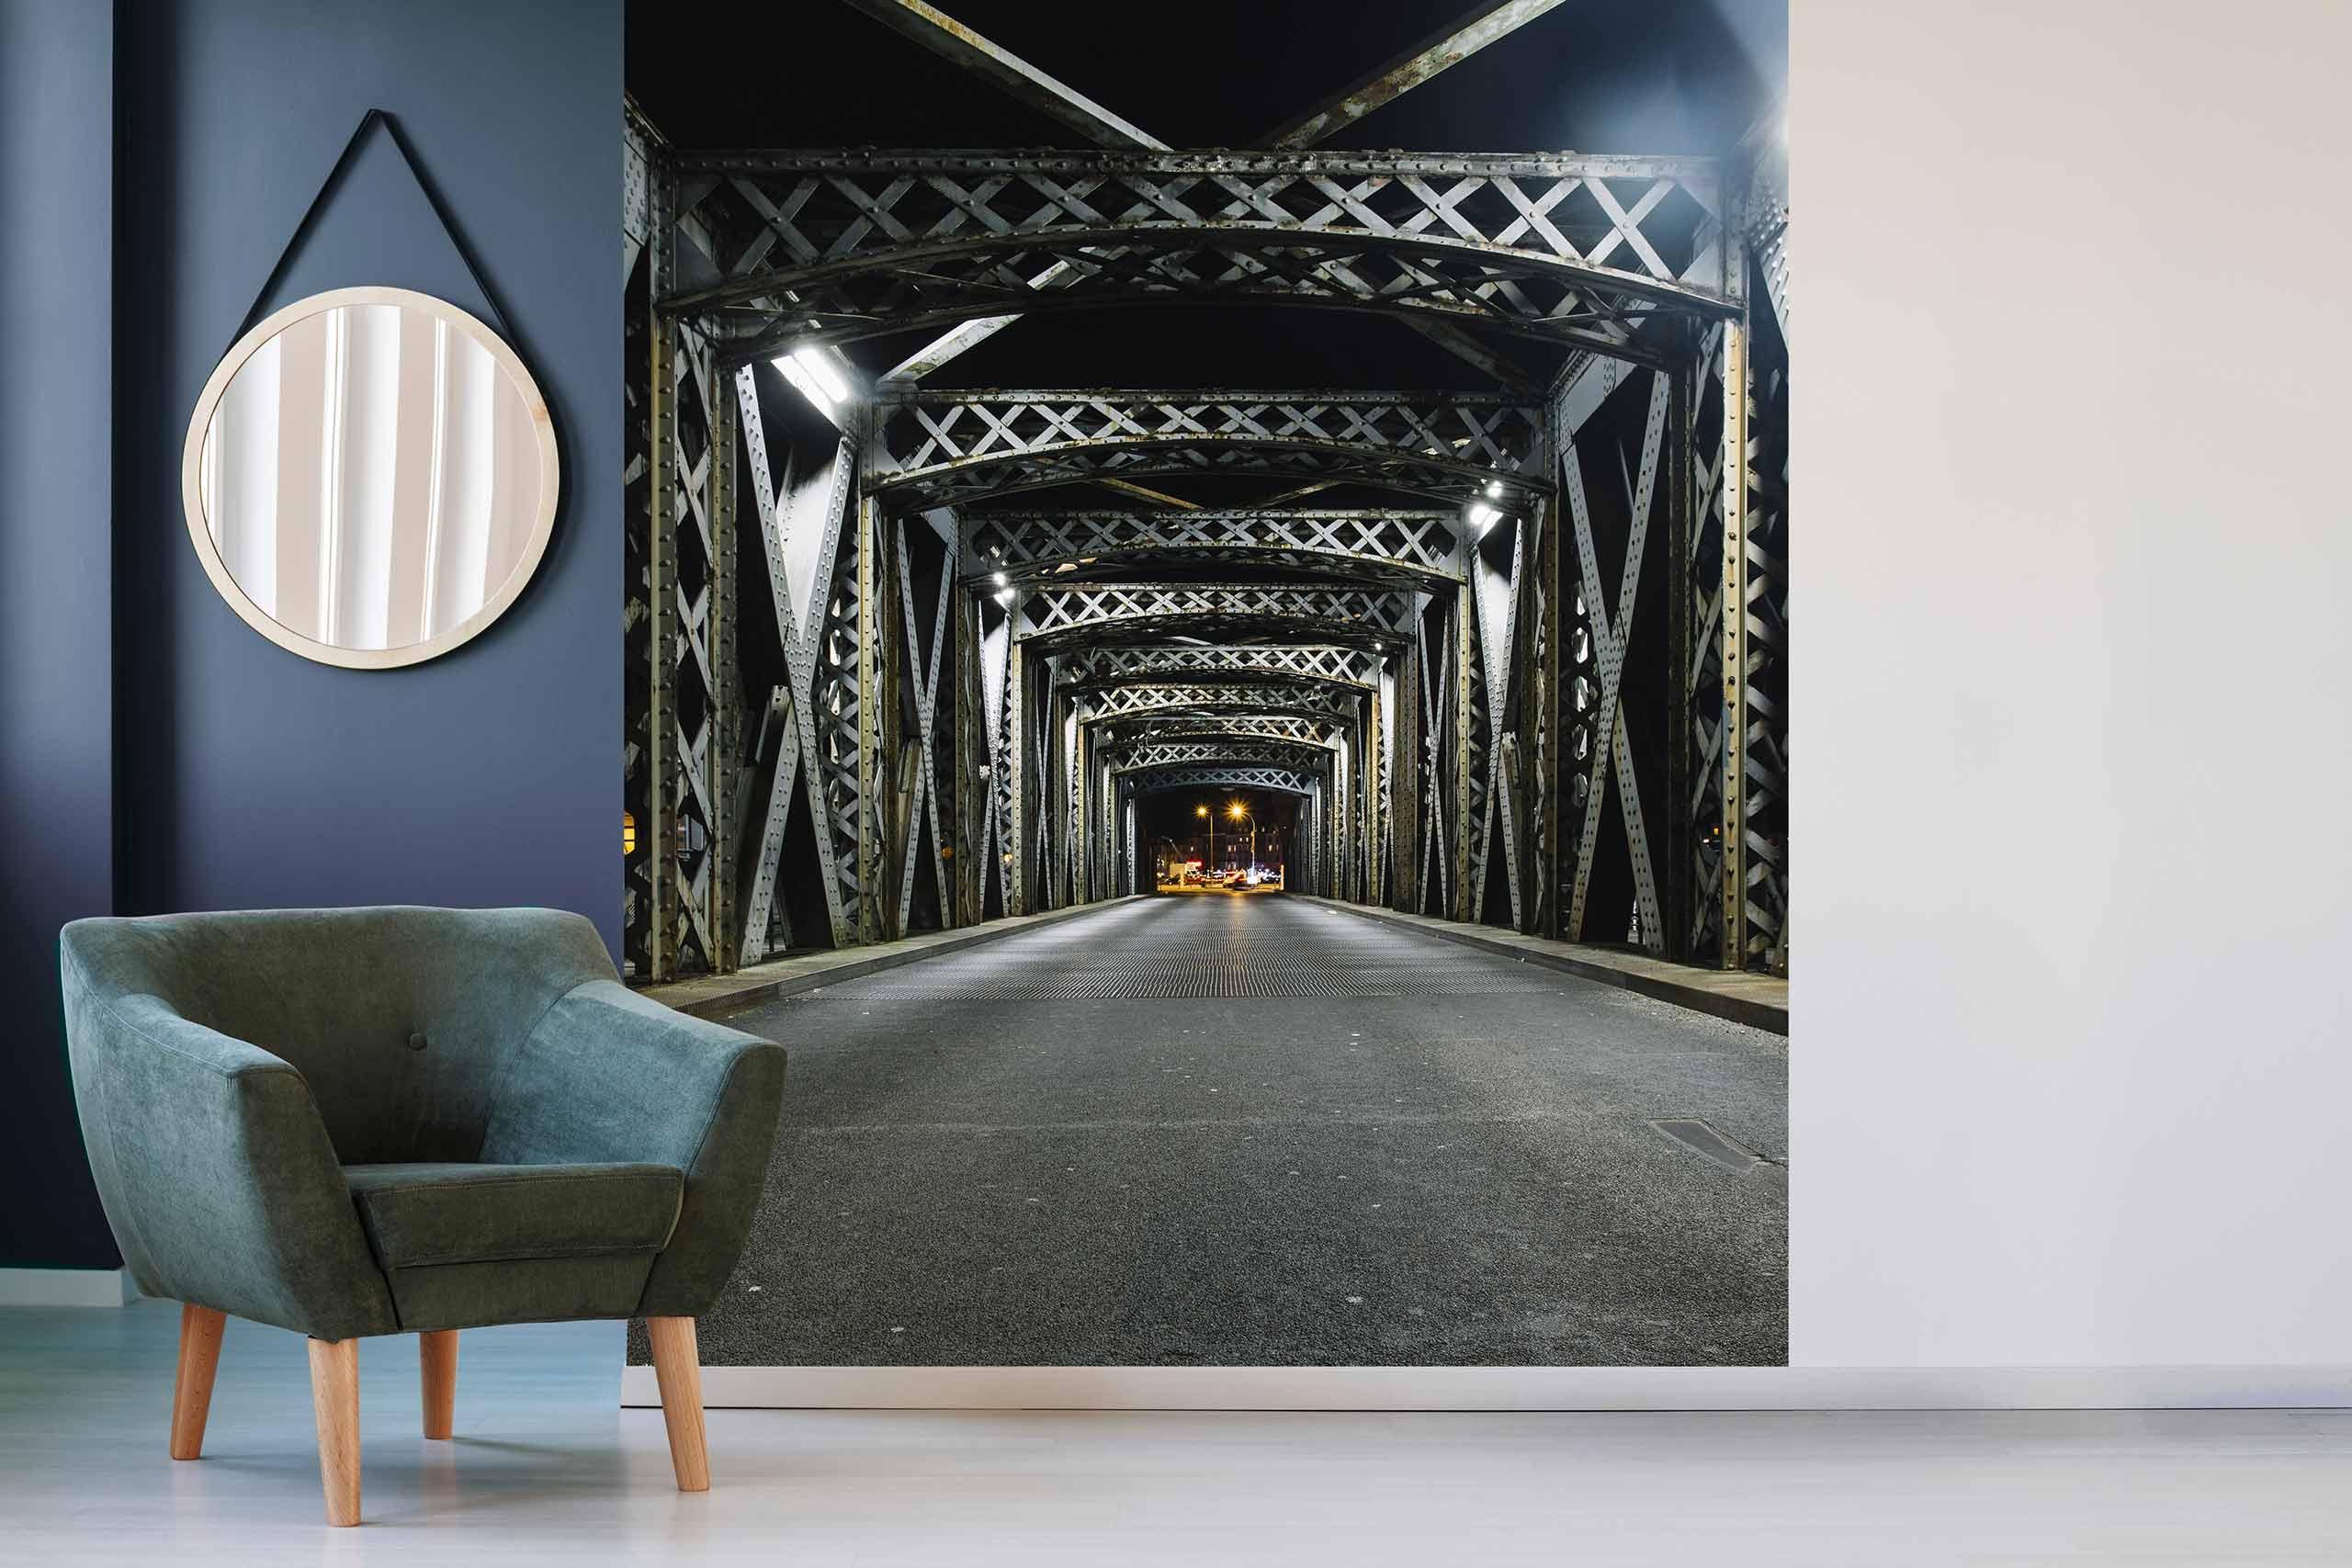 Vlies Tapete 225 Fototapete Höhe 250cm Motiv 122 Brücke